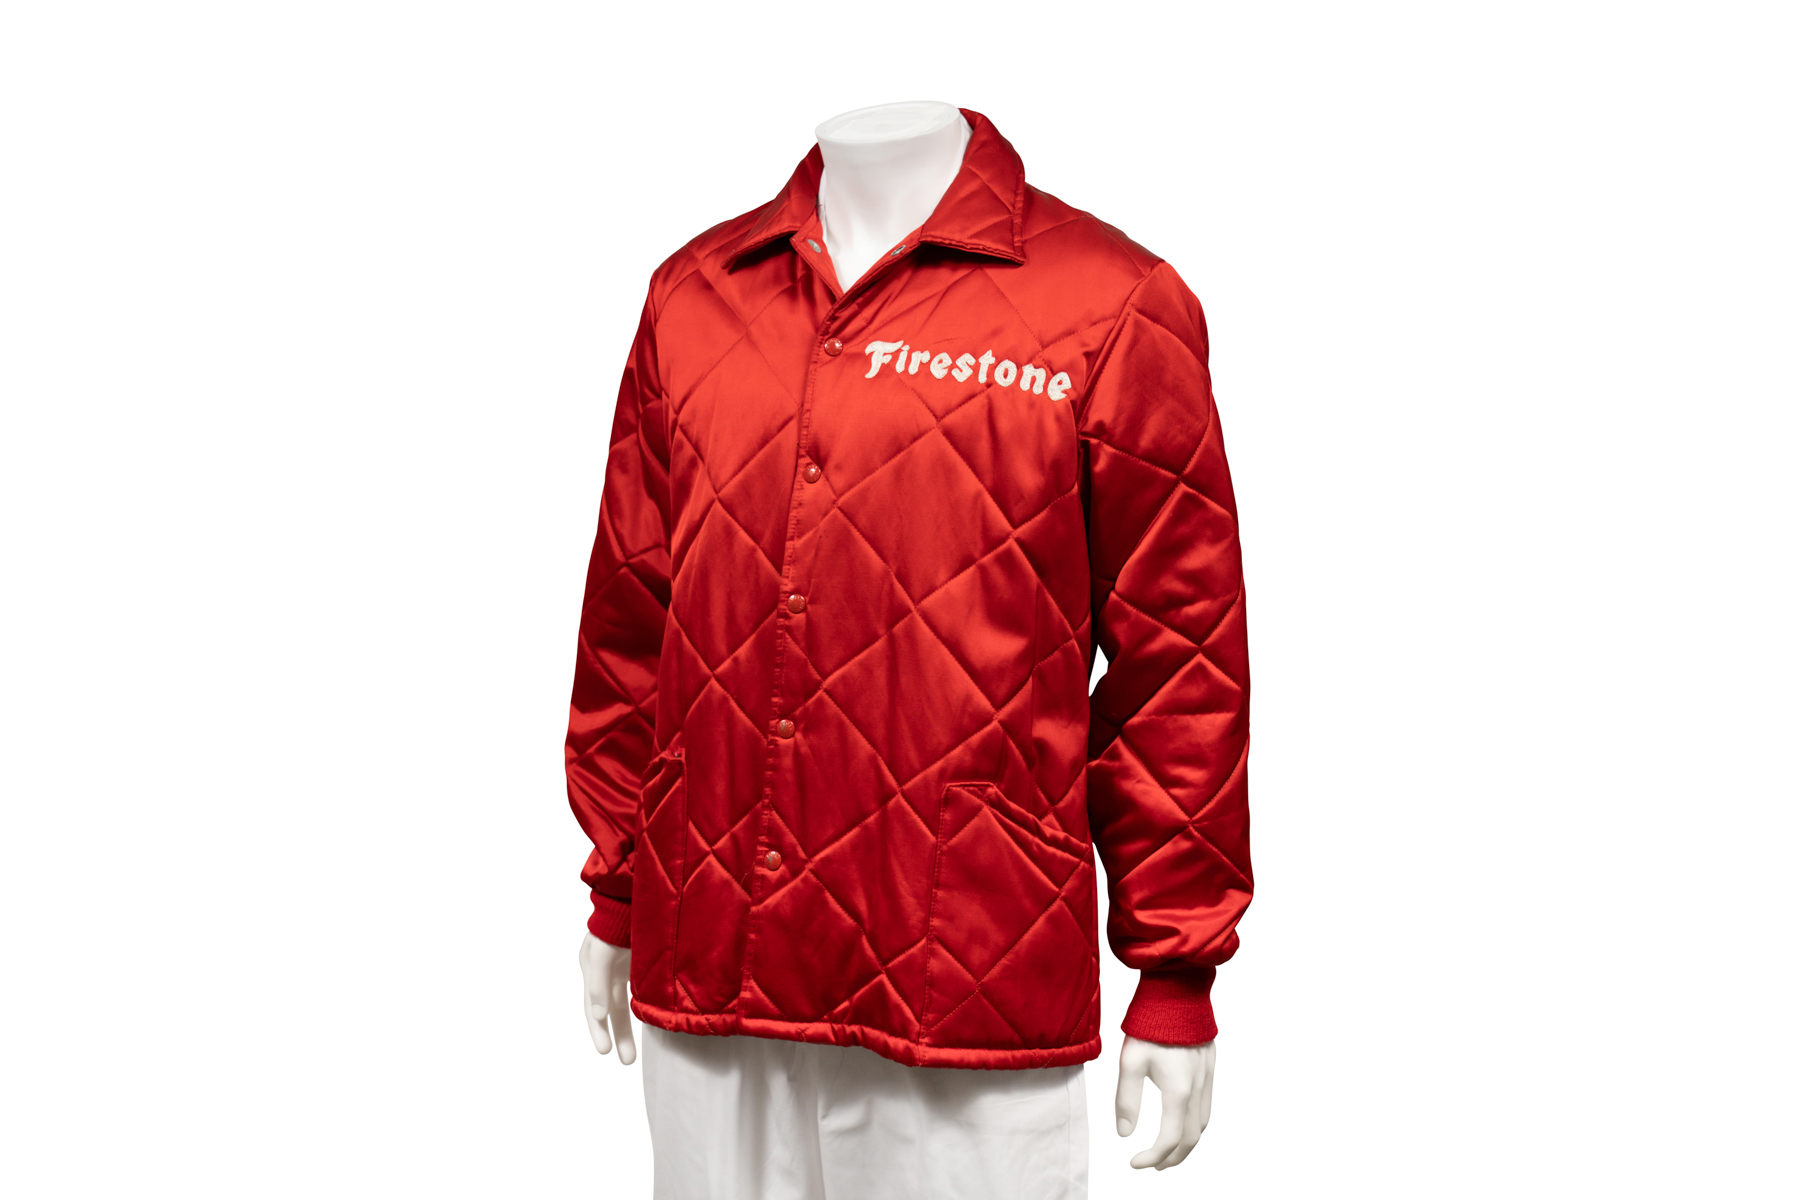 phil hill chaparral jacket front